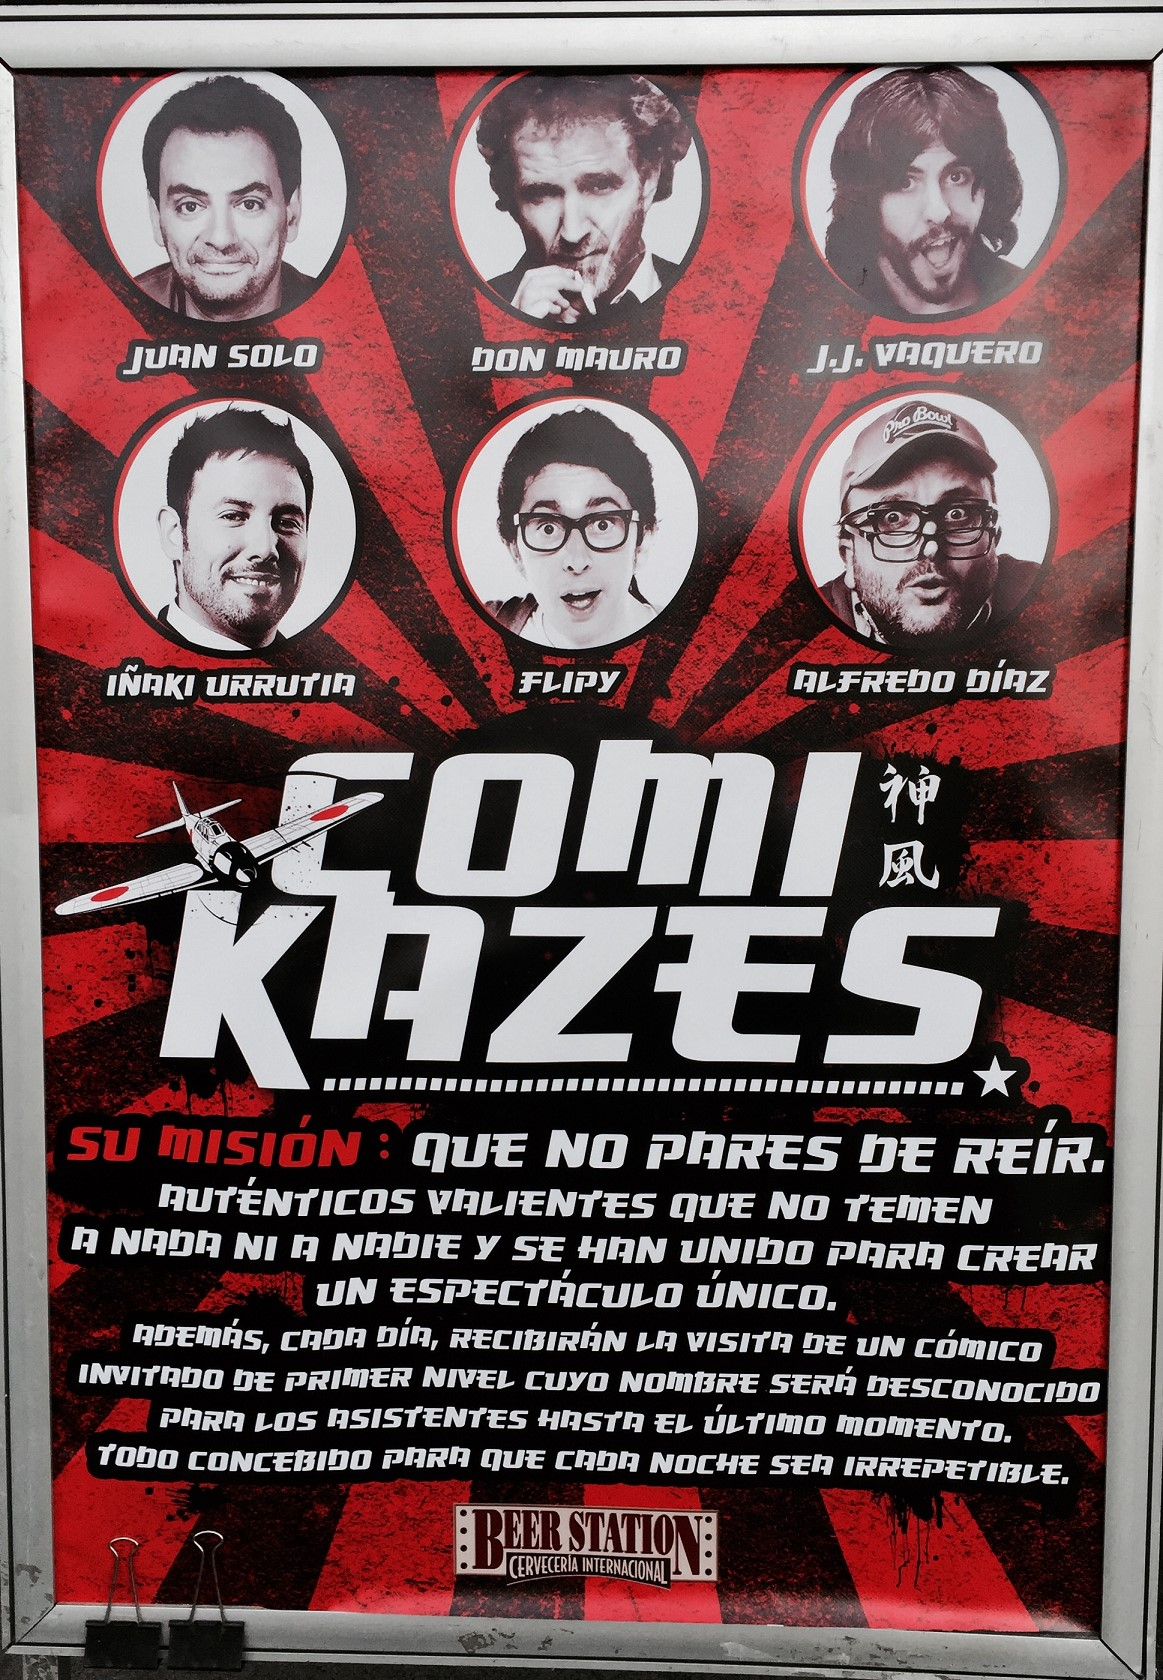 Cartel de los Comikazes - Juan Solo - Don Mauro - JJ Vaquero - Iñaki Urrutia - Flipy - Alfredo Díaz - Beer Station - Comikaces